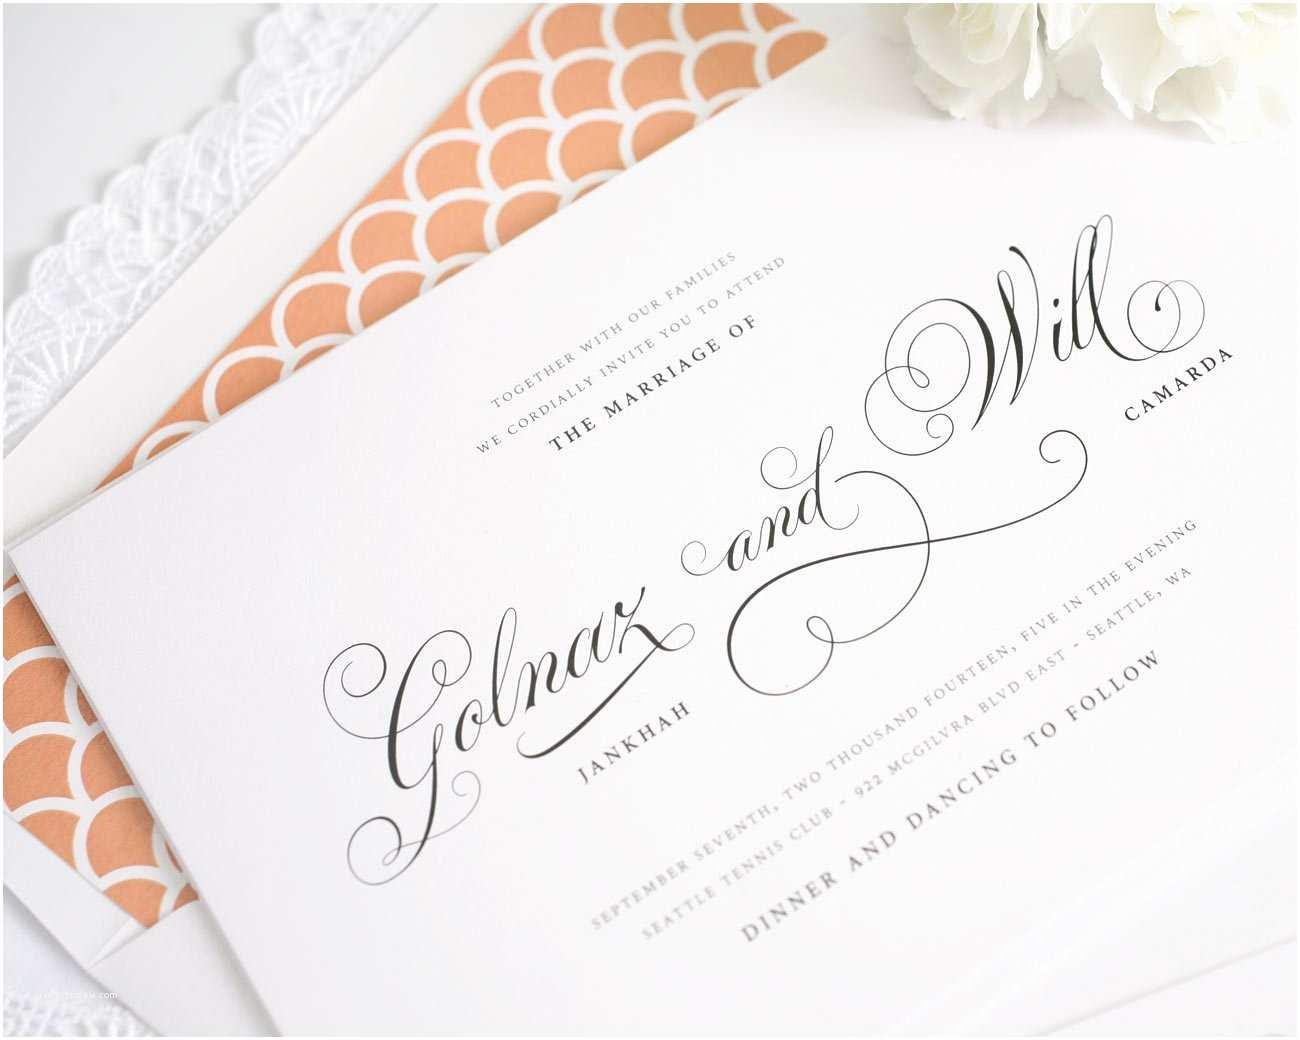 Peach Wedding Invitations Peach Gold and Aqua Wedding Inspiration – Wedding Invitations